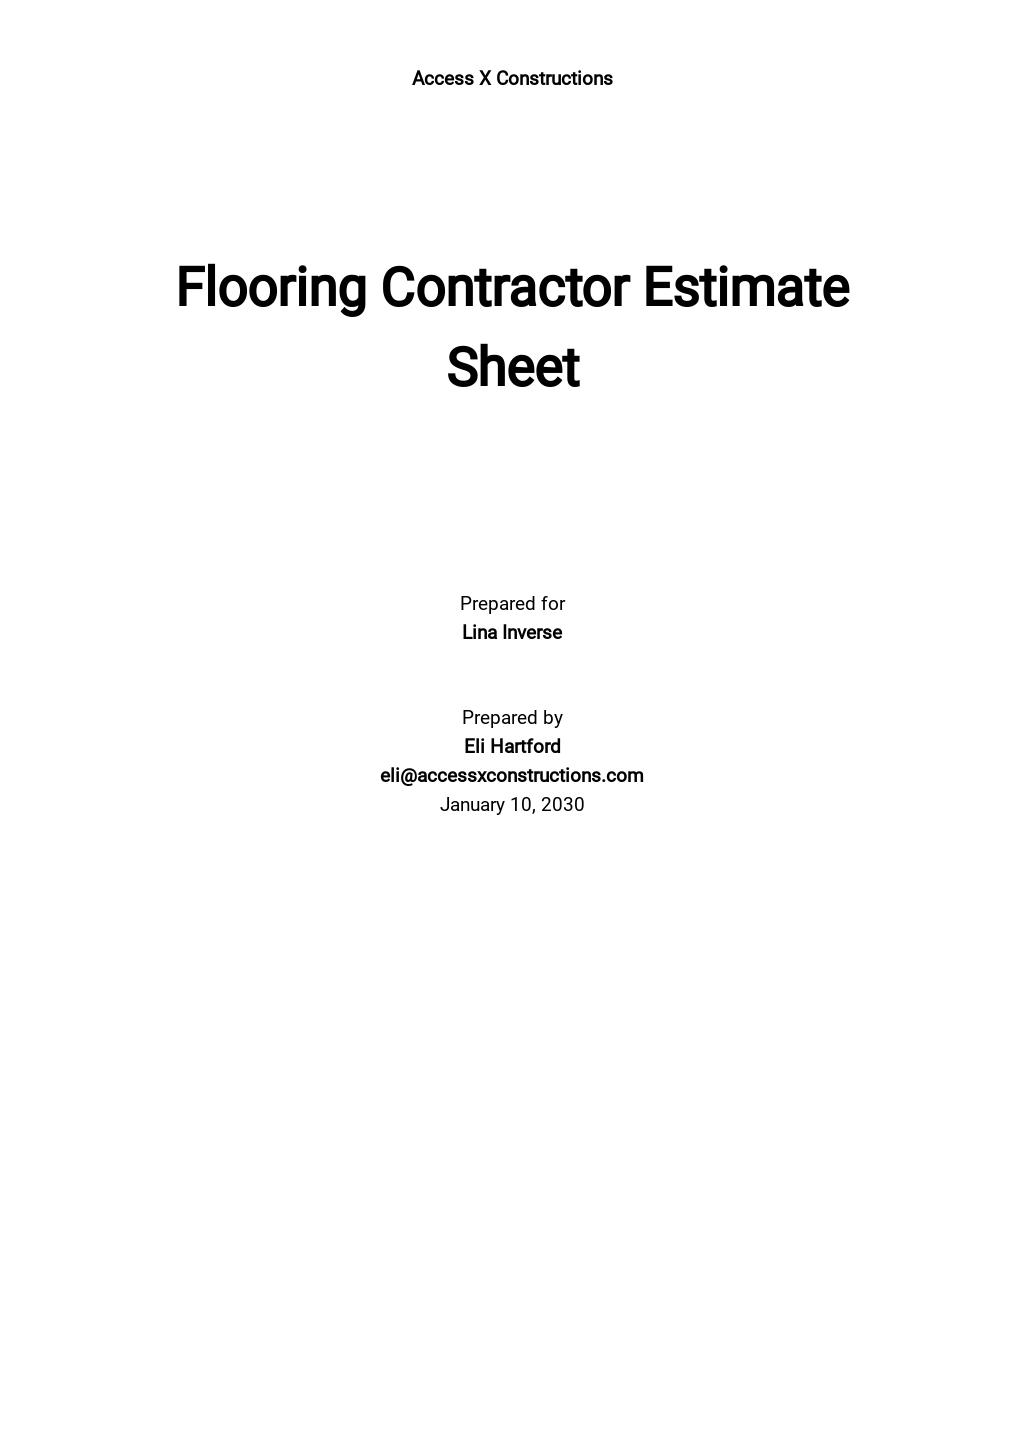 Free Flooring Contractor Estimate Sheet Template.jpe